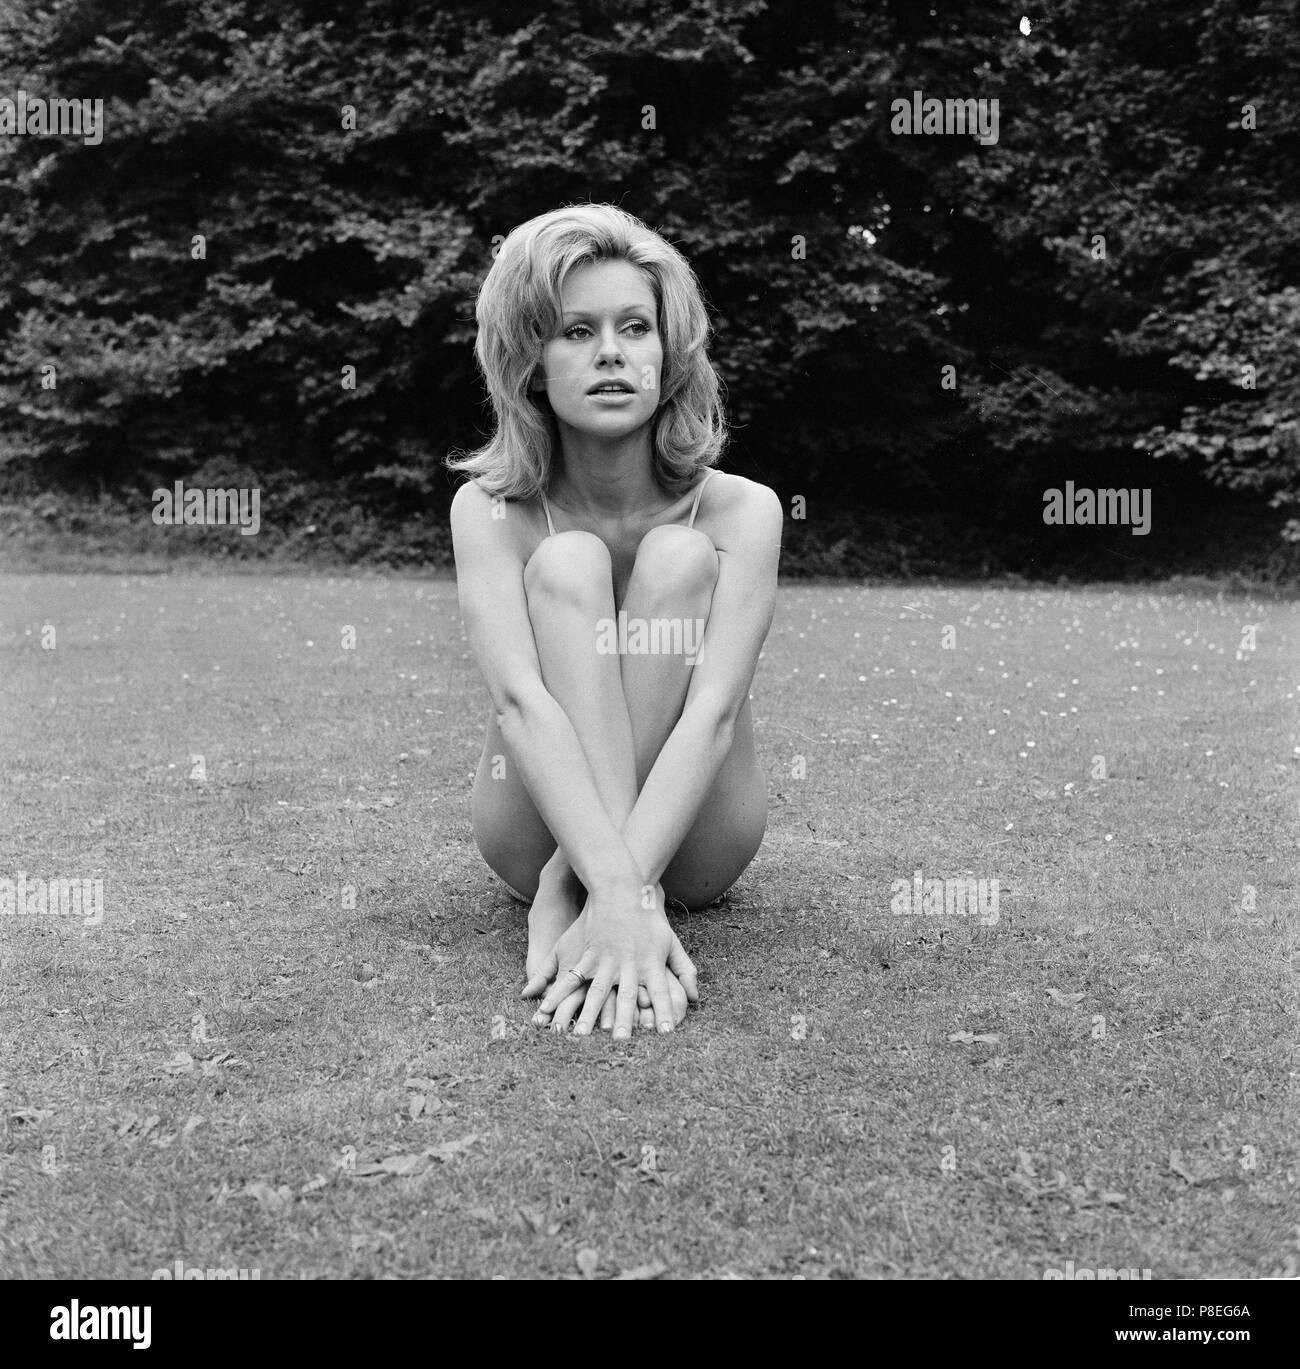 Iain Robertson (born 1981) images